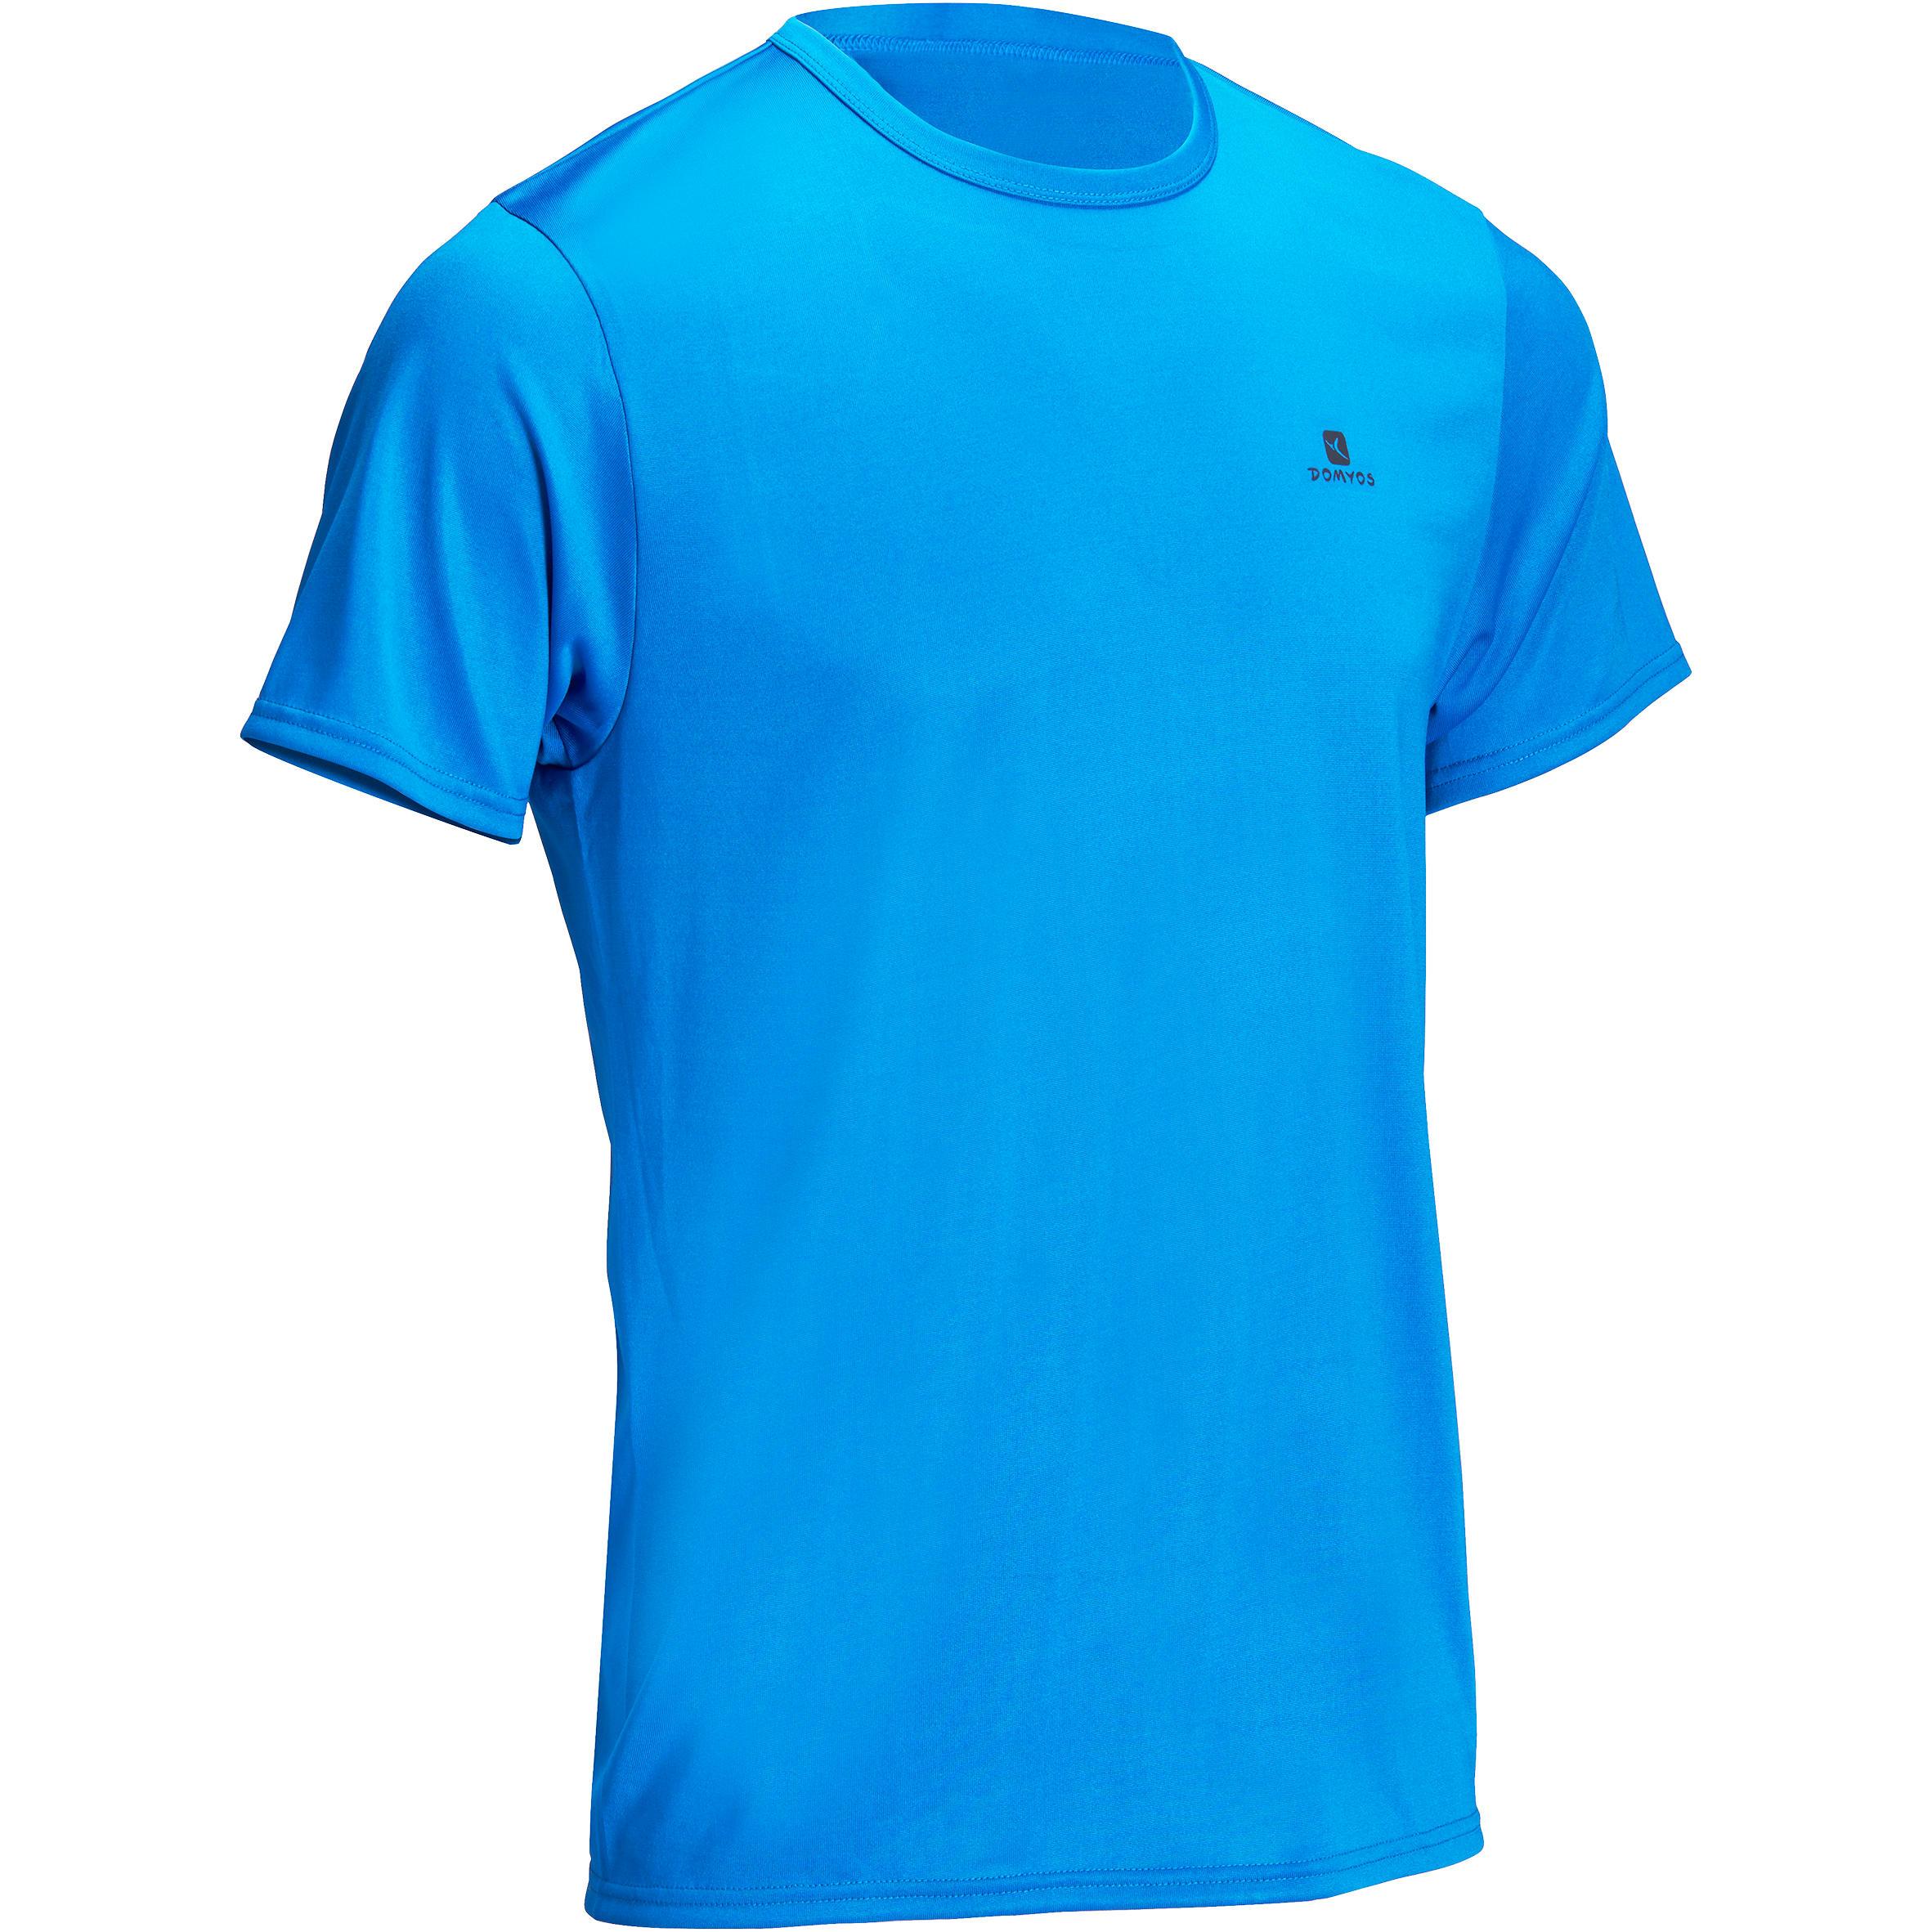 Playera fitness cardio hombre azul Energy